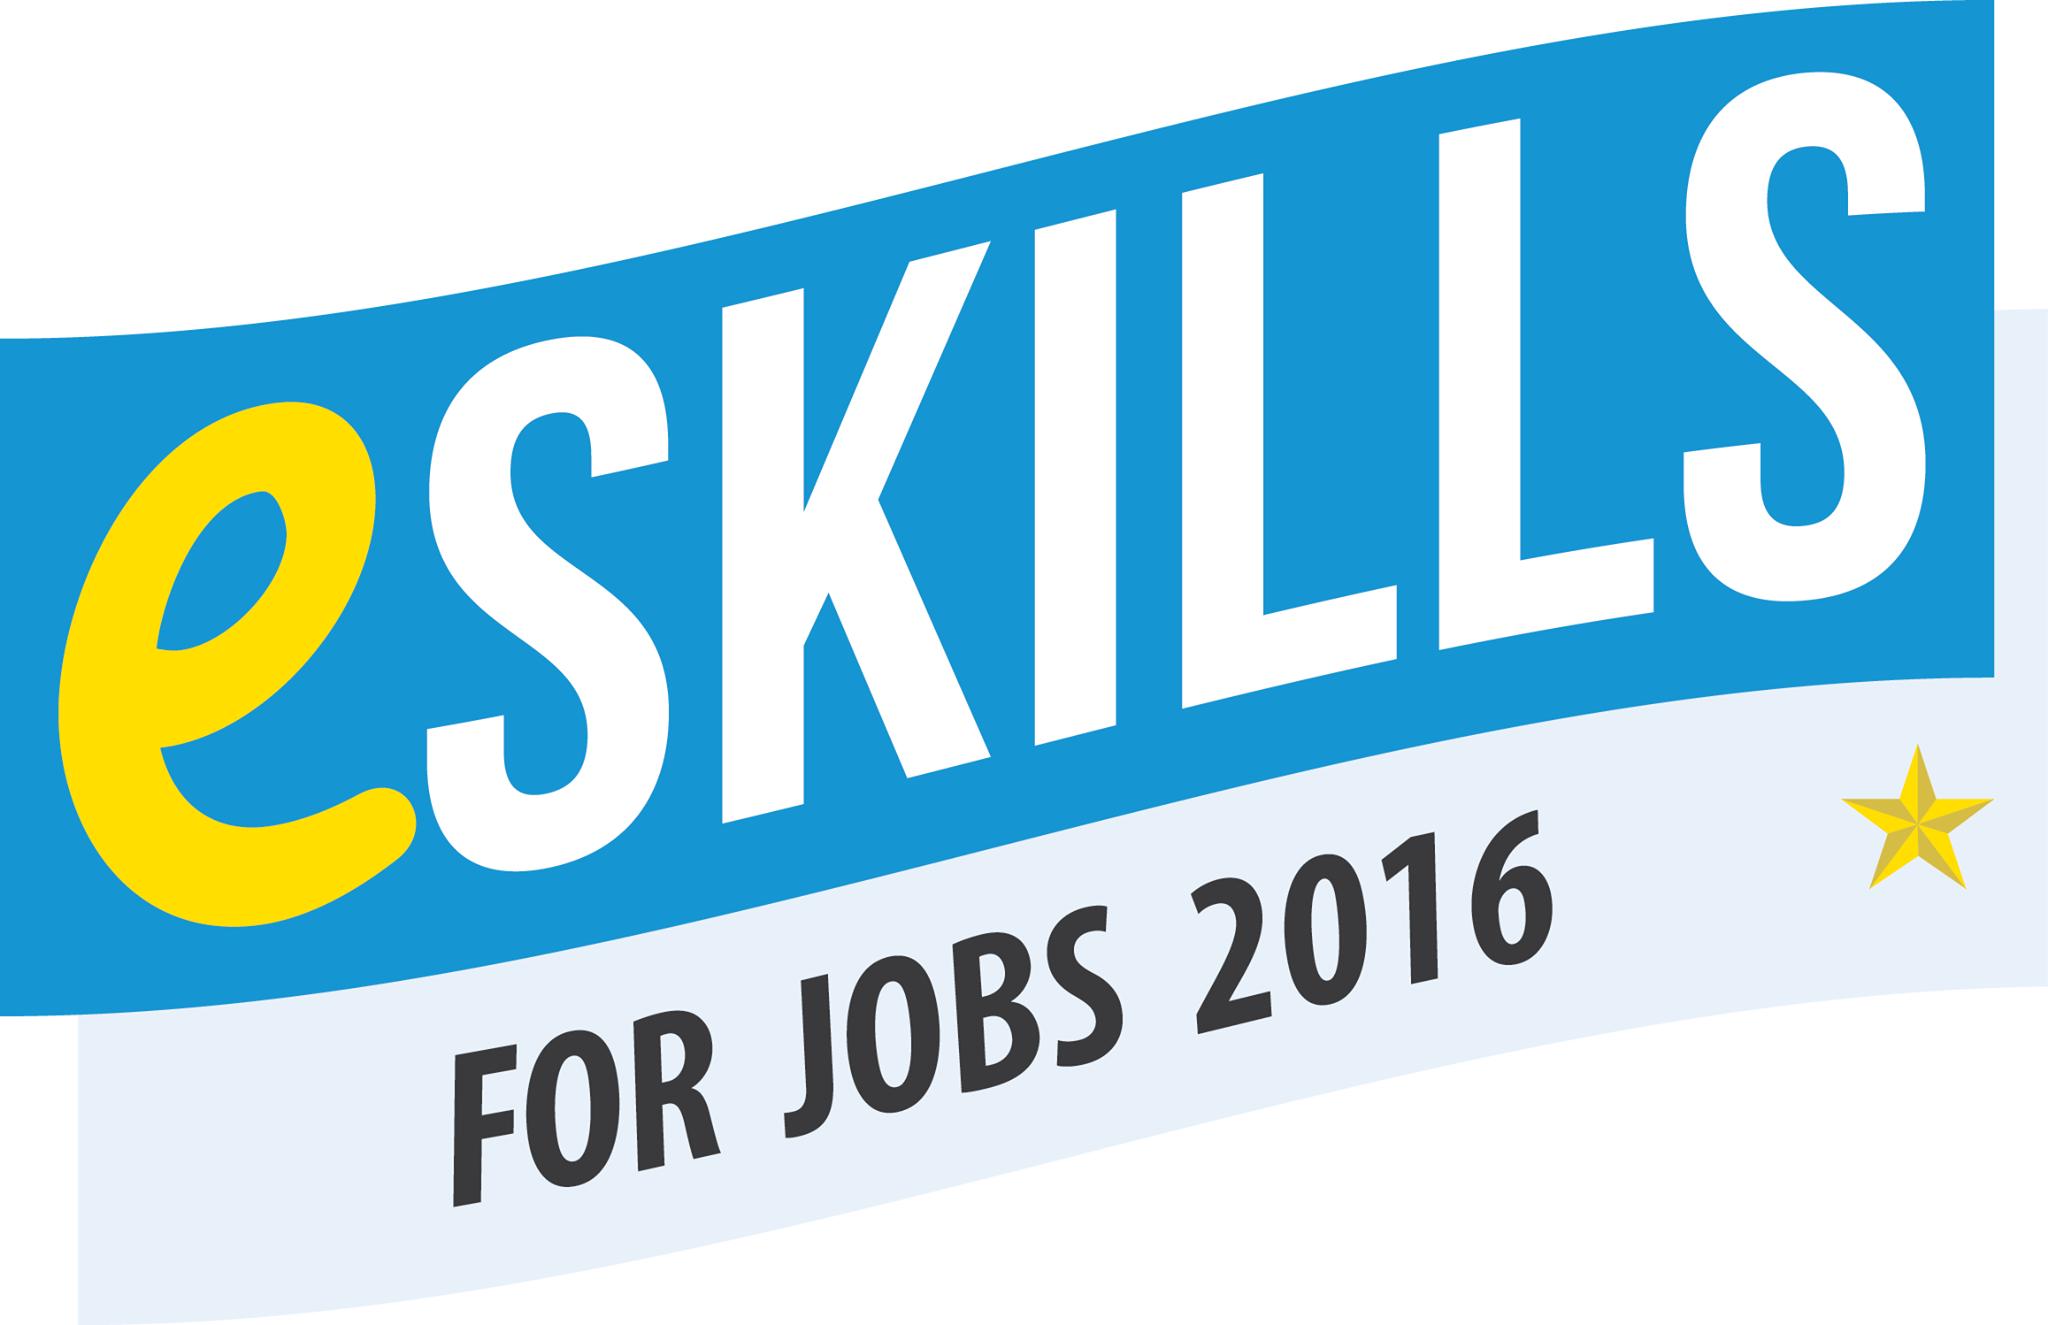 Concurs european pentru programatori, eSkills for Jobs